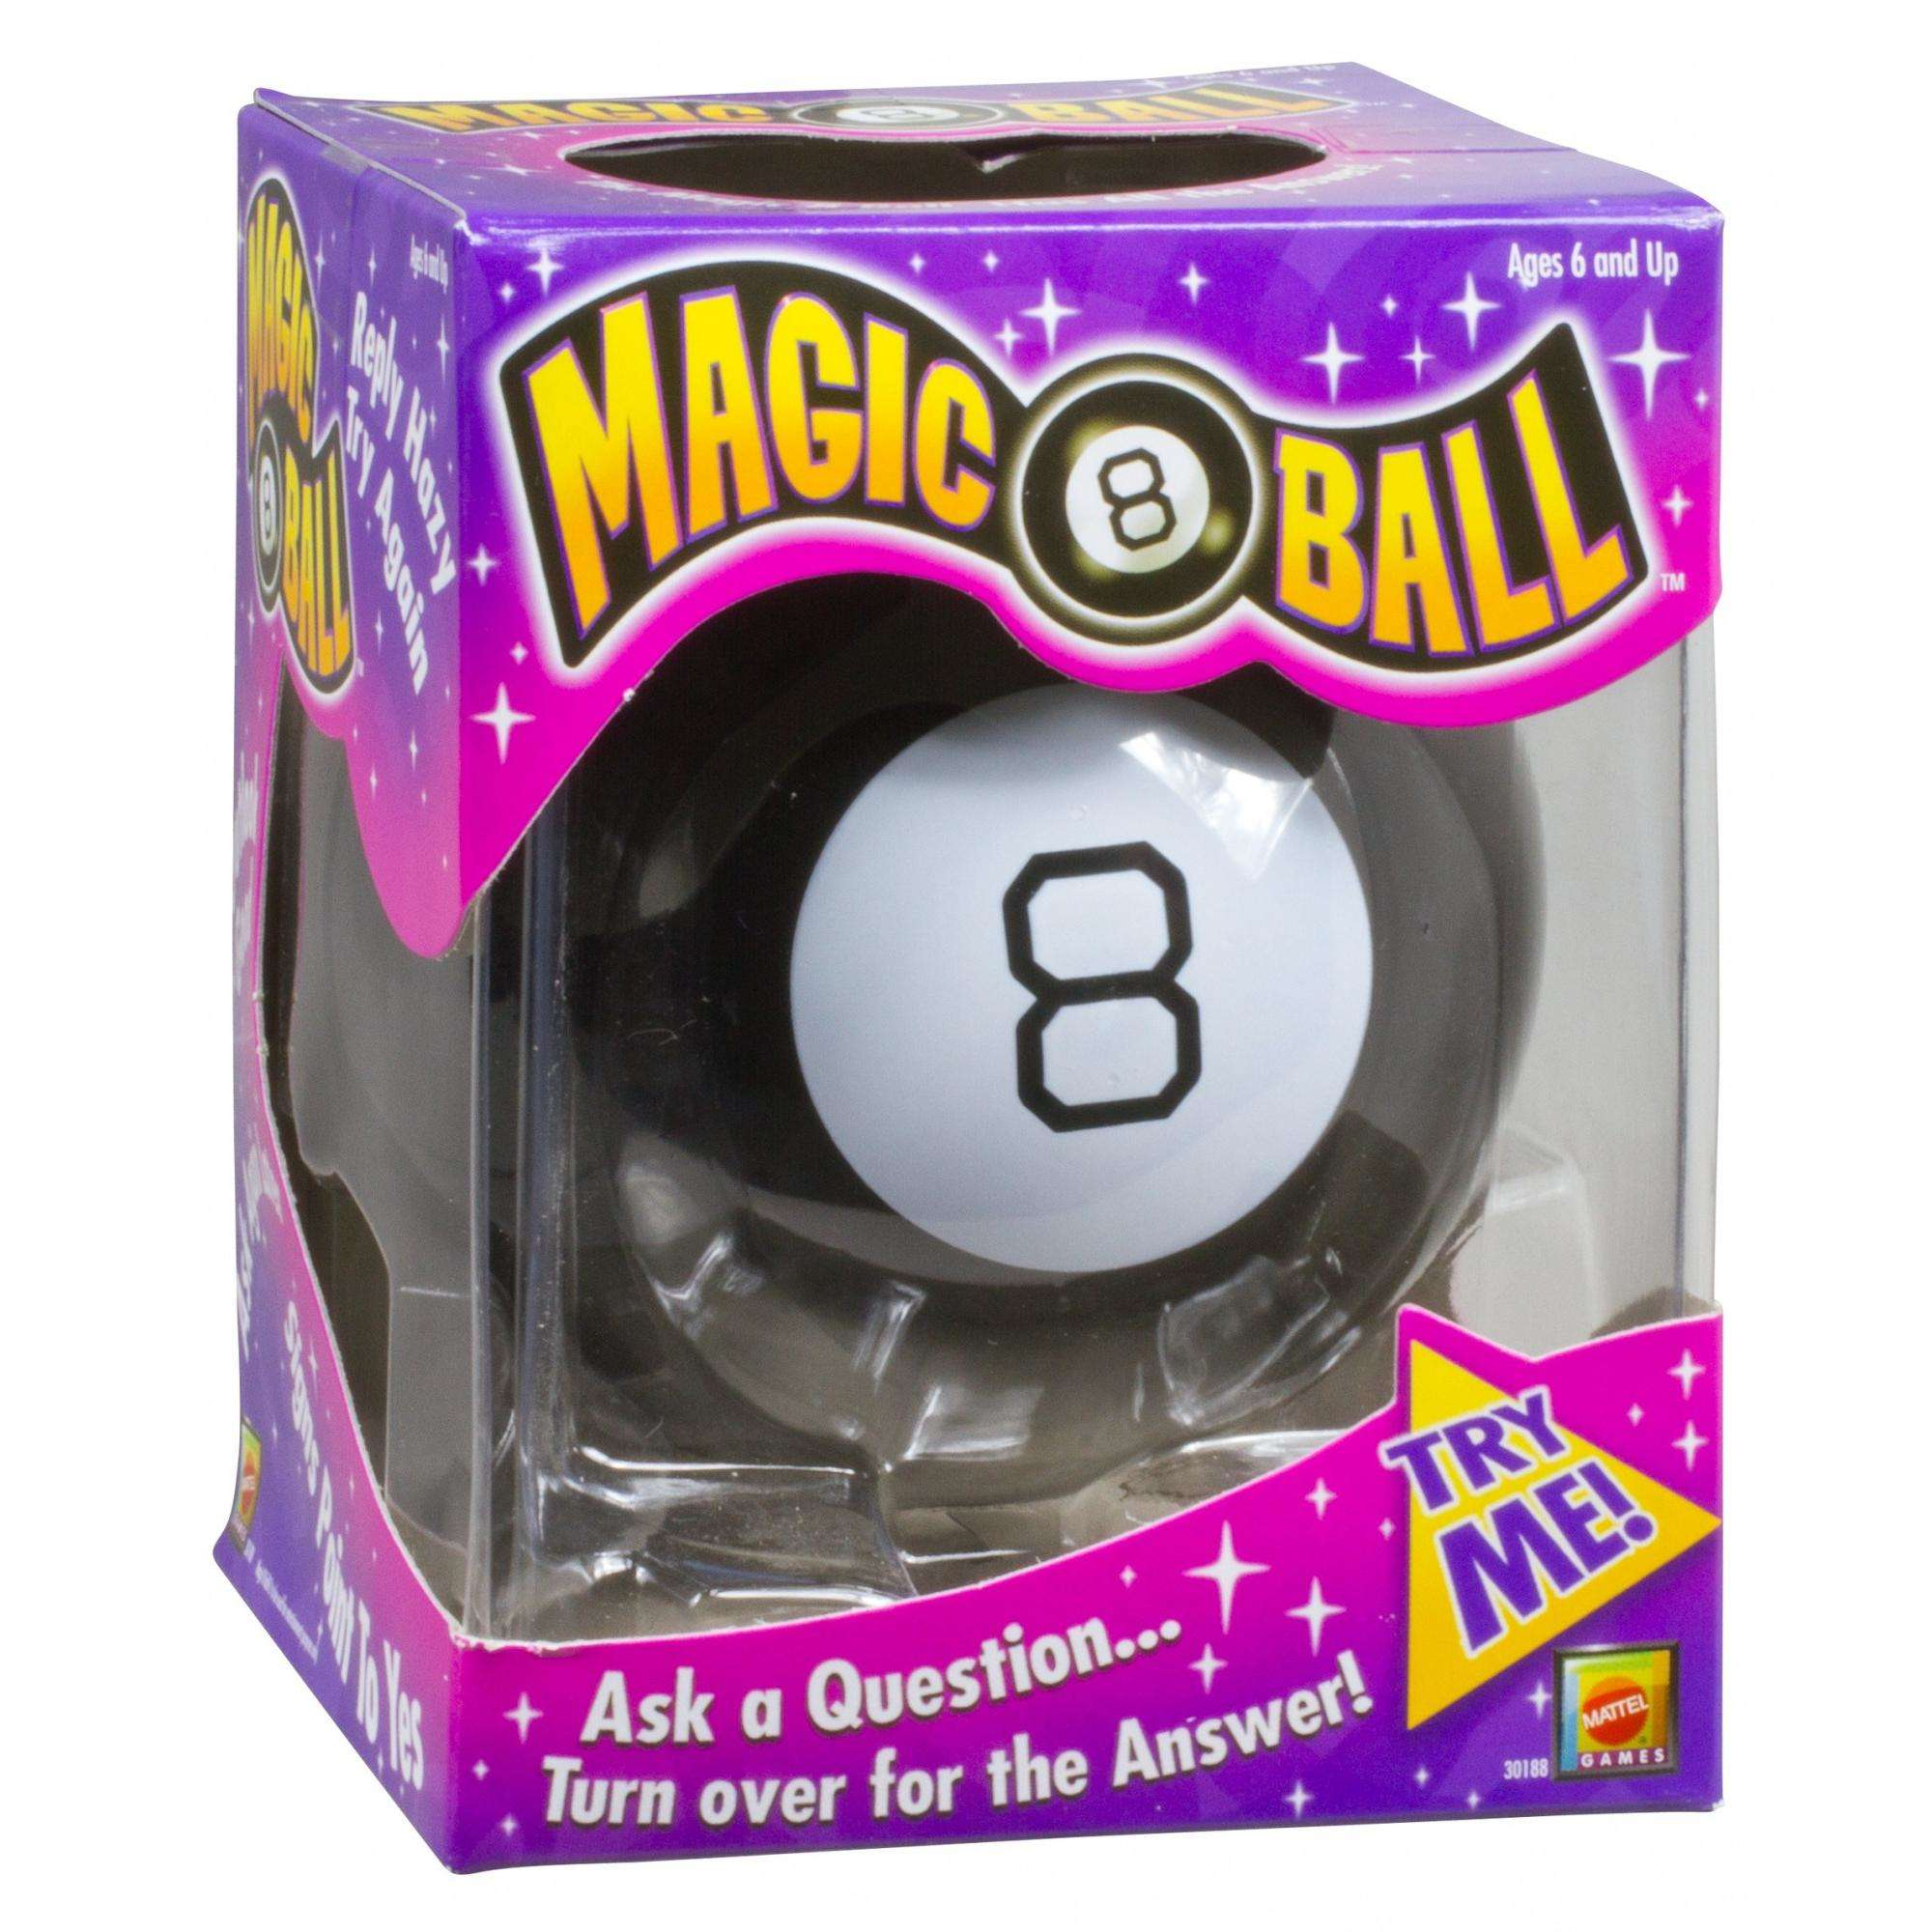 Magic 8 Ball Classic Fortune-Telling Novelty Toy - Walmart.com 5e7a58645f